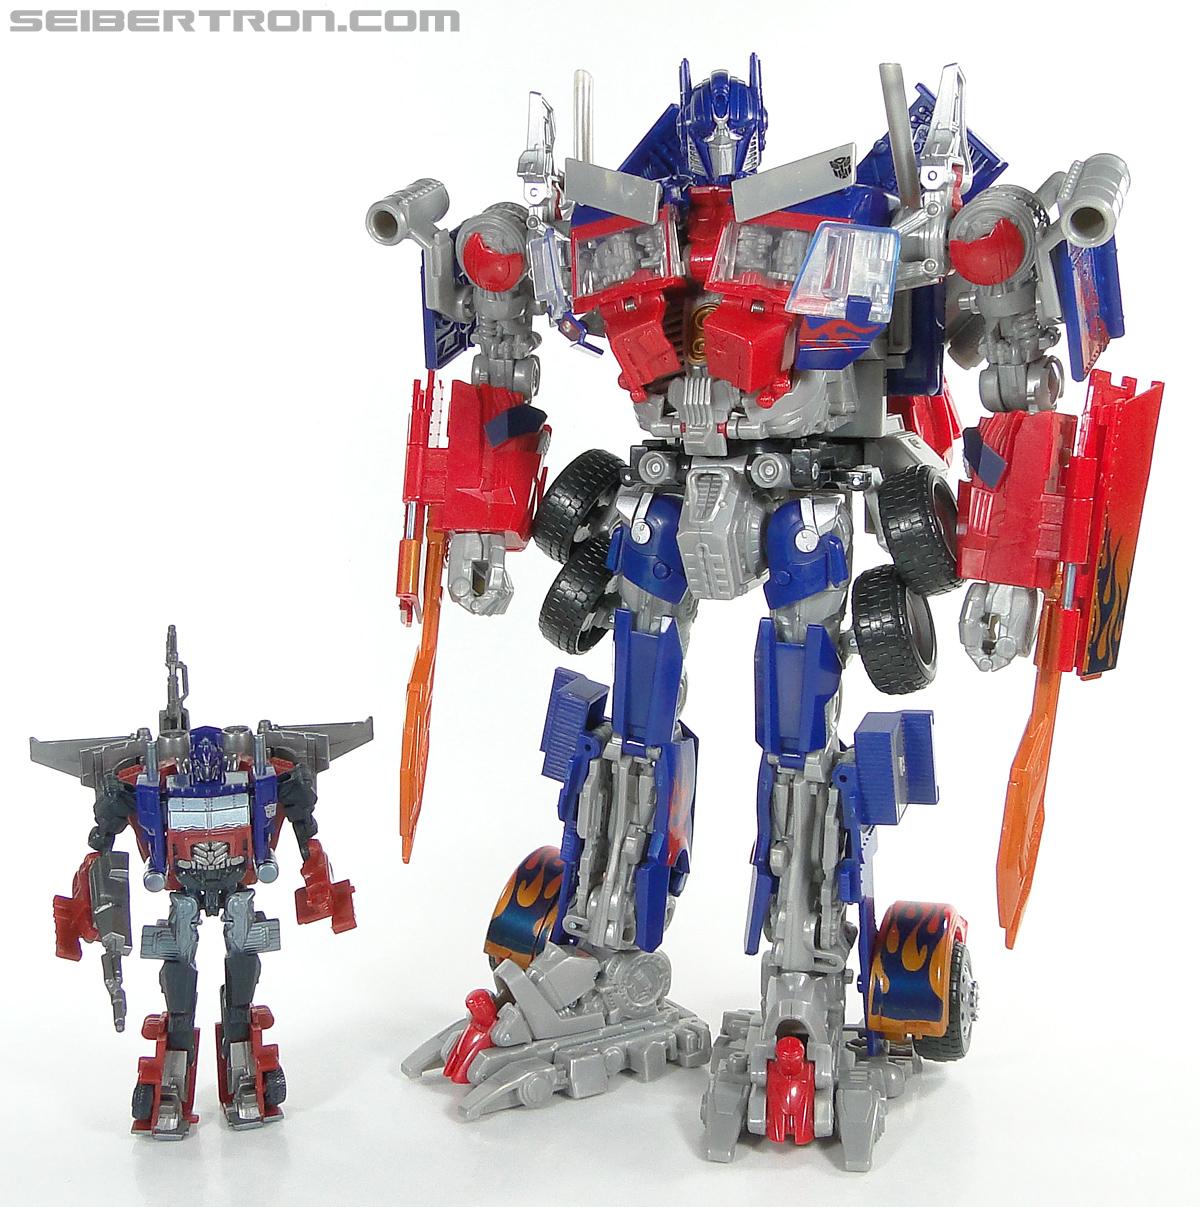 Transformers Dark of the Moon Optimus Prime (Image #208 of 235)